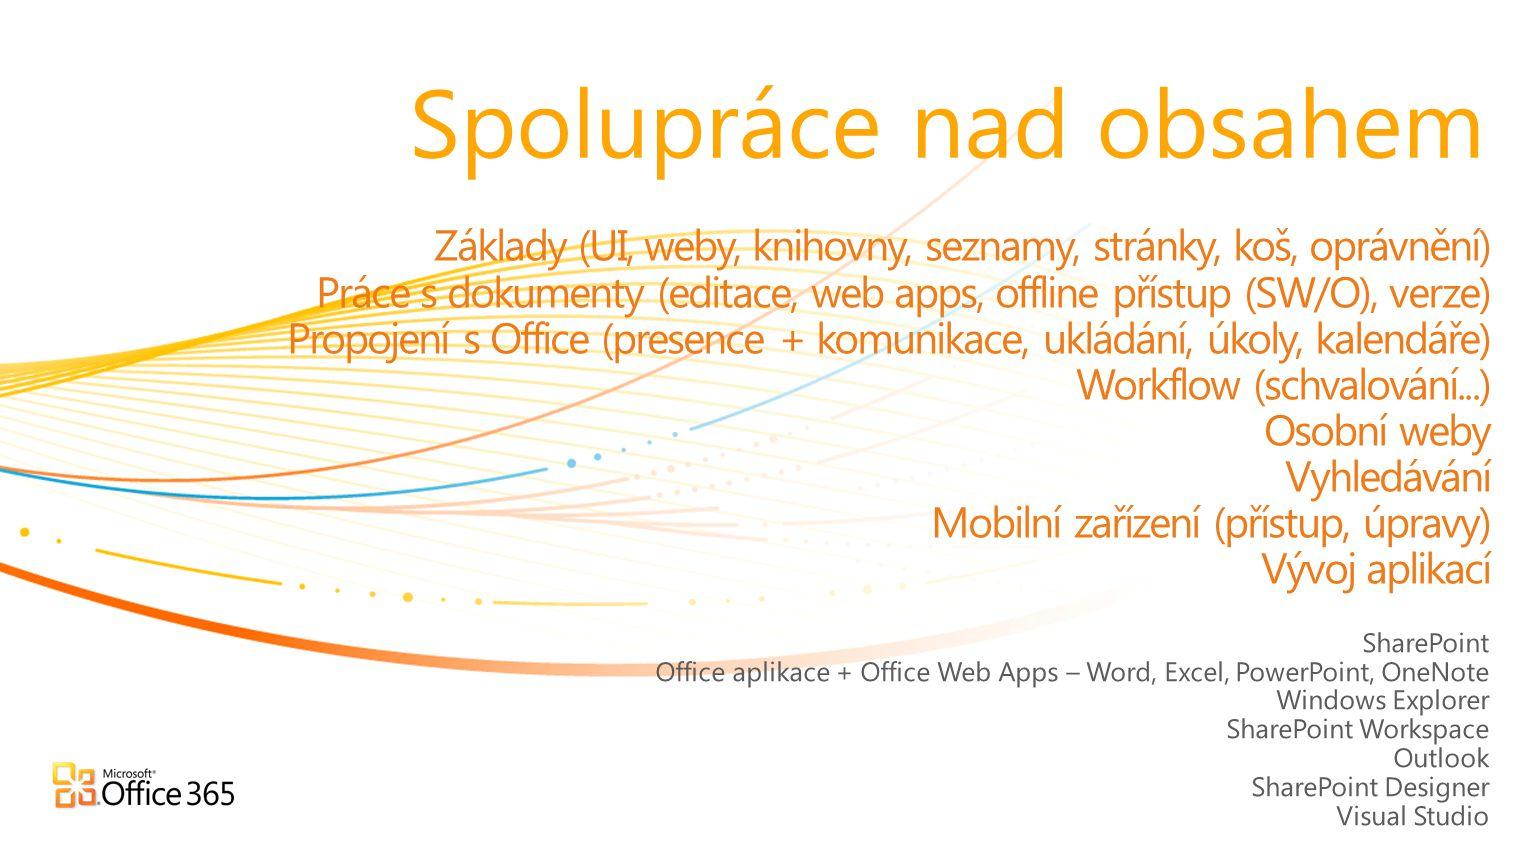 SharePoint Office aplikace + Office Web Apps – Word, Excel, PowerPoint, OneNote Windows Explorer SharePoint Workspace Outlook SharePoint Designer Visu